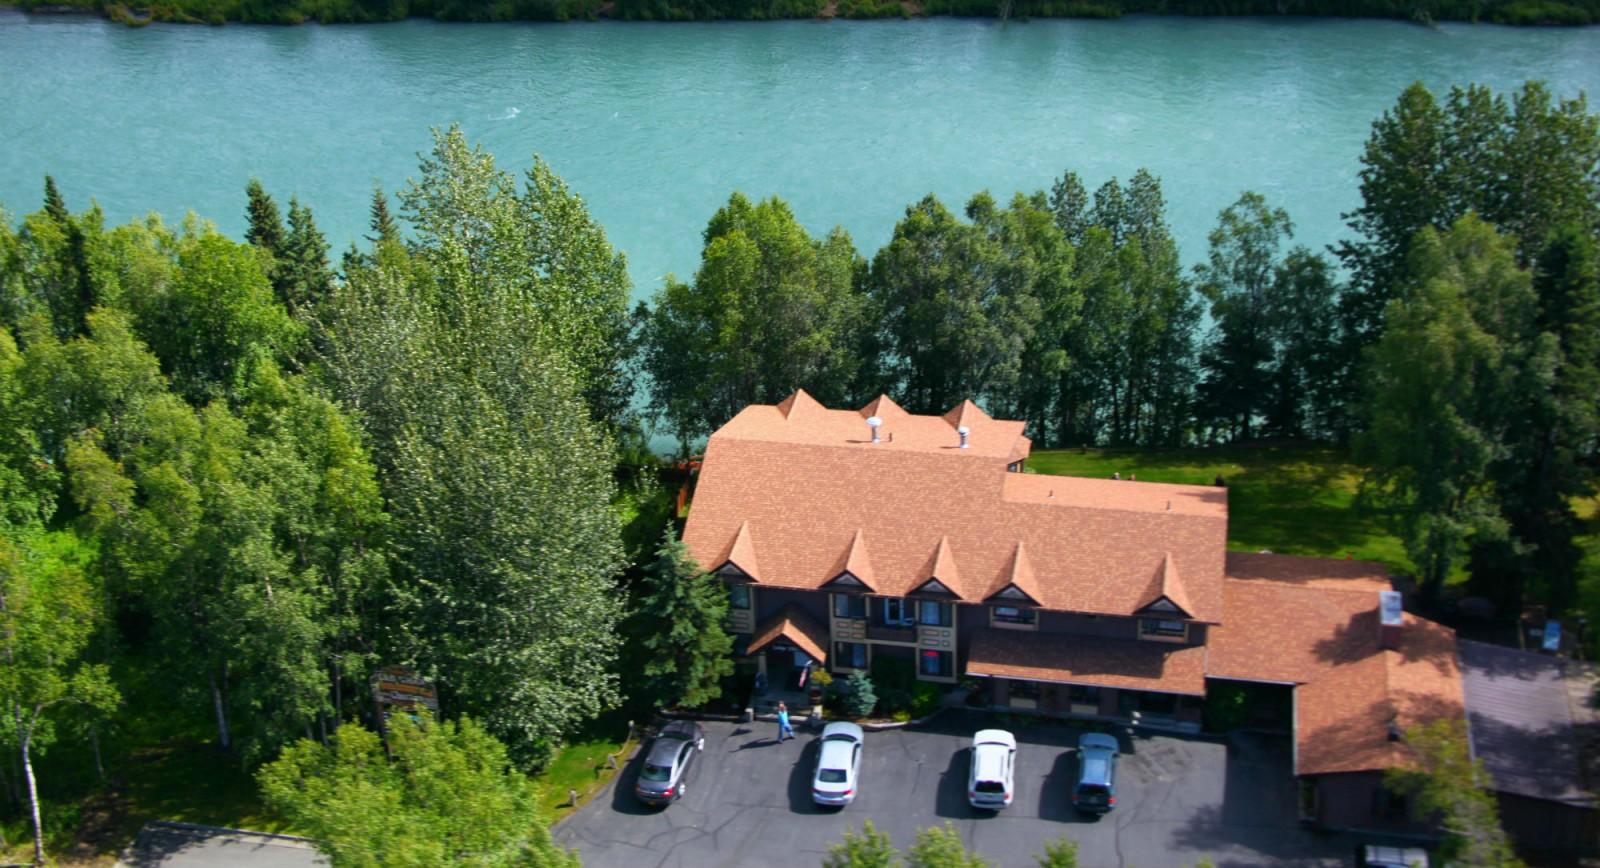 Alaska Fishing Lodge and Soldotna B&B Charters